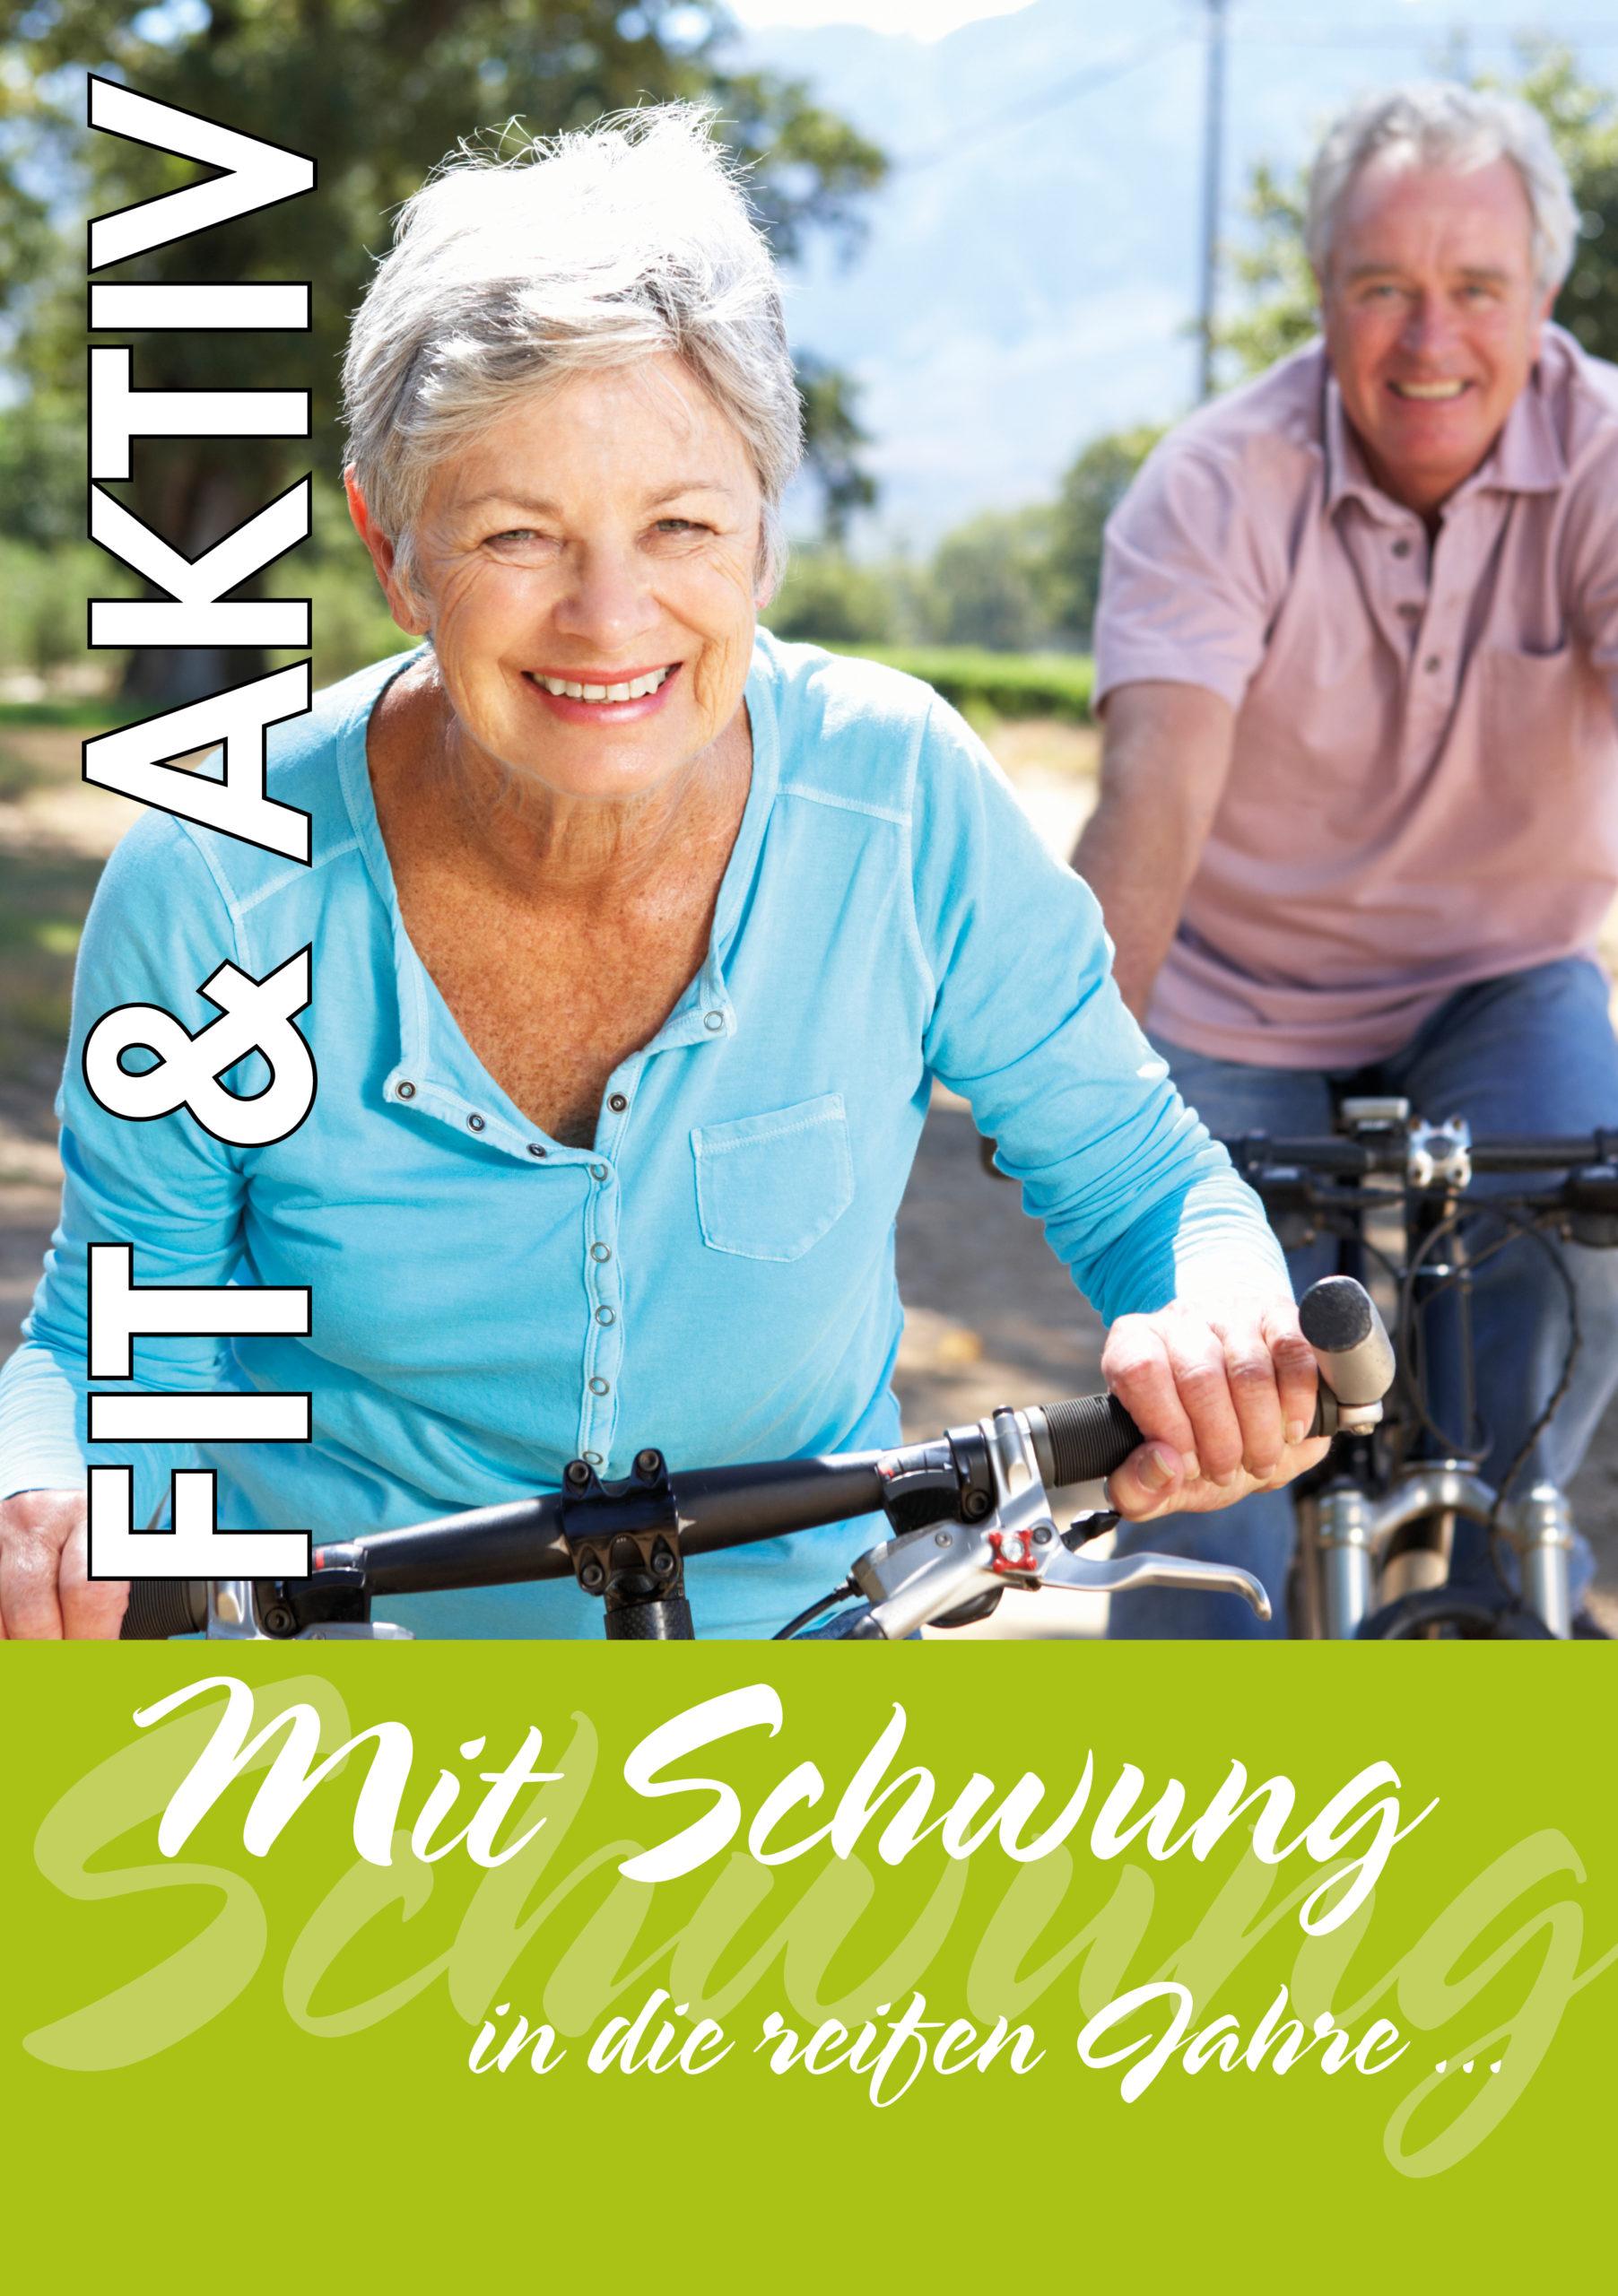 Fit und Aktiv - Seniorenratgeber